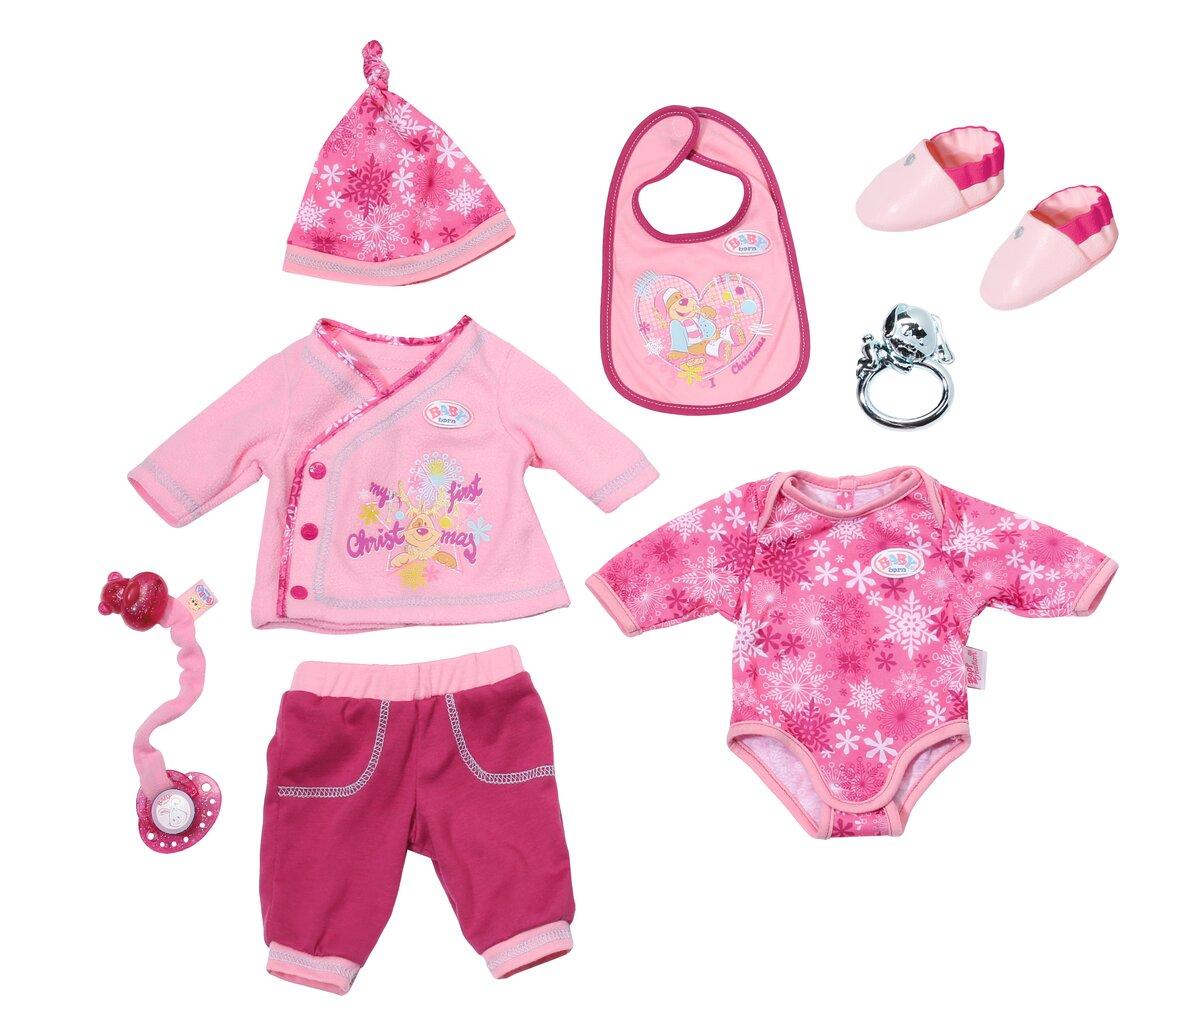 Картинки беби бон одежда, летием для сына